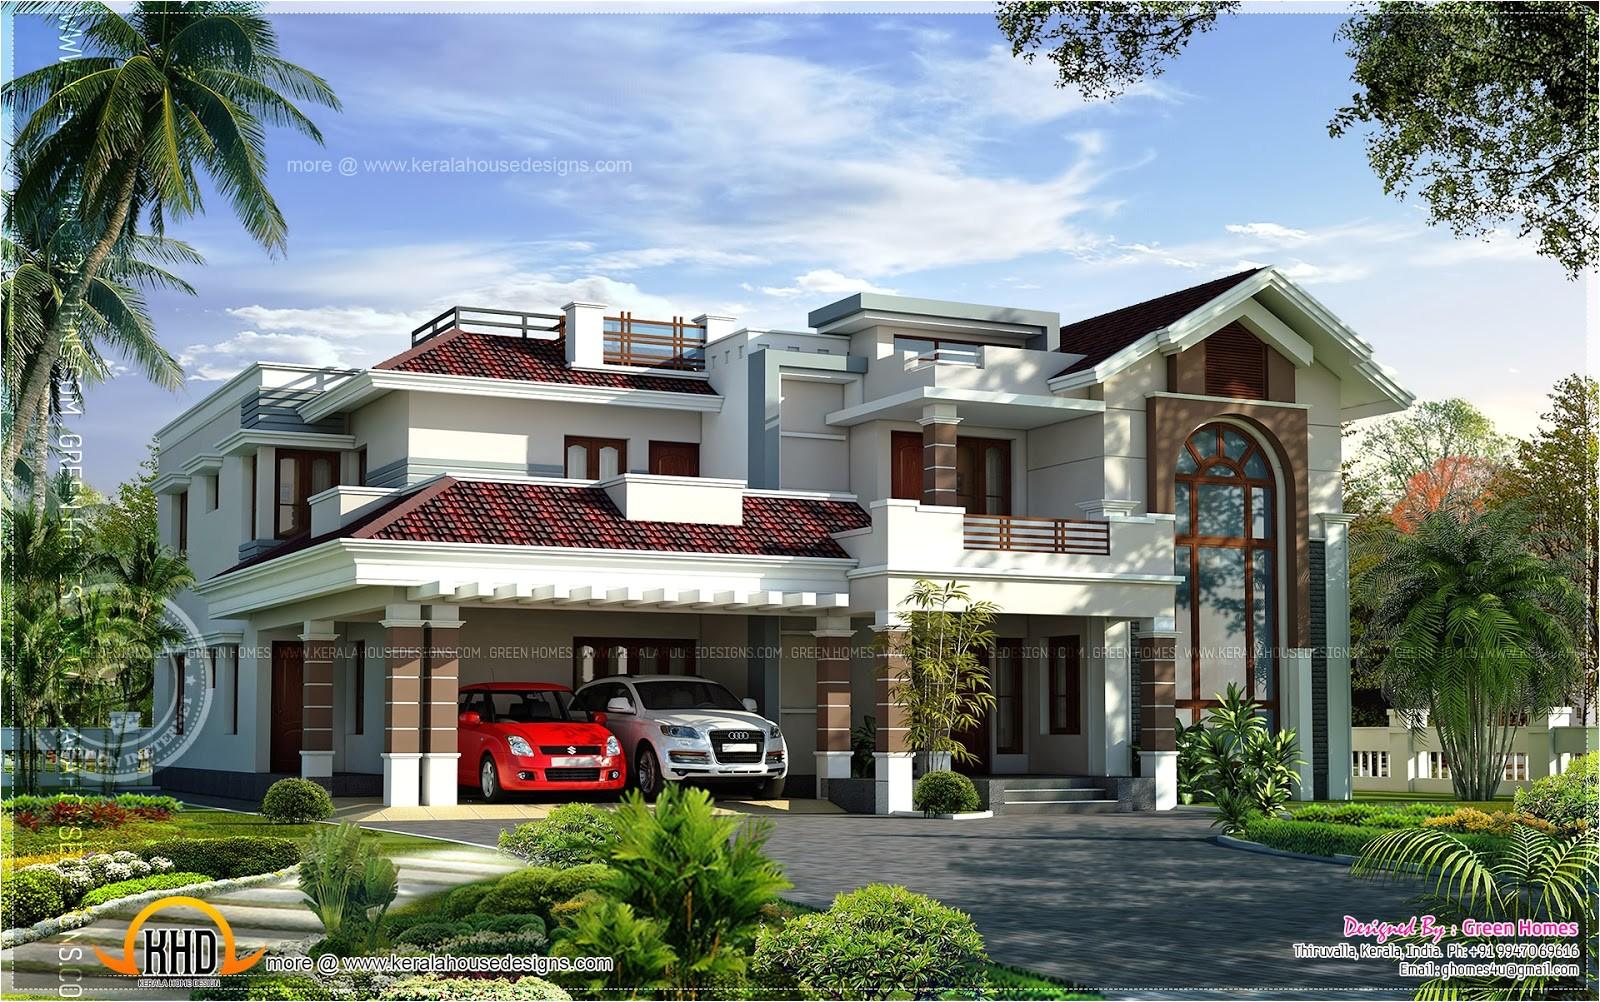 Luxury Homes Plans Designs 400 Square Yards Luxury Villa Design Kerala Home  Design